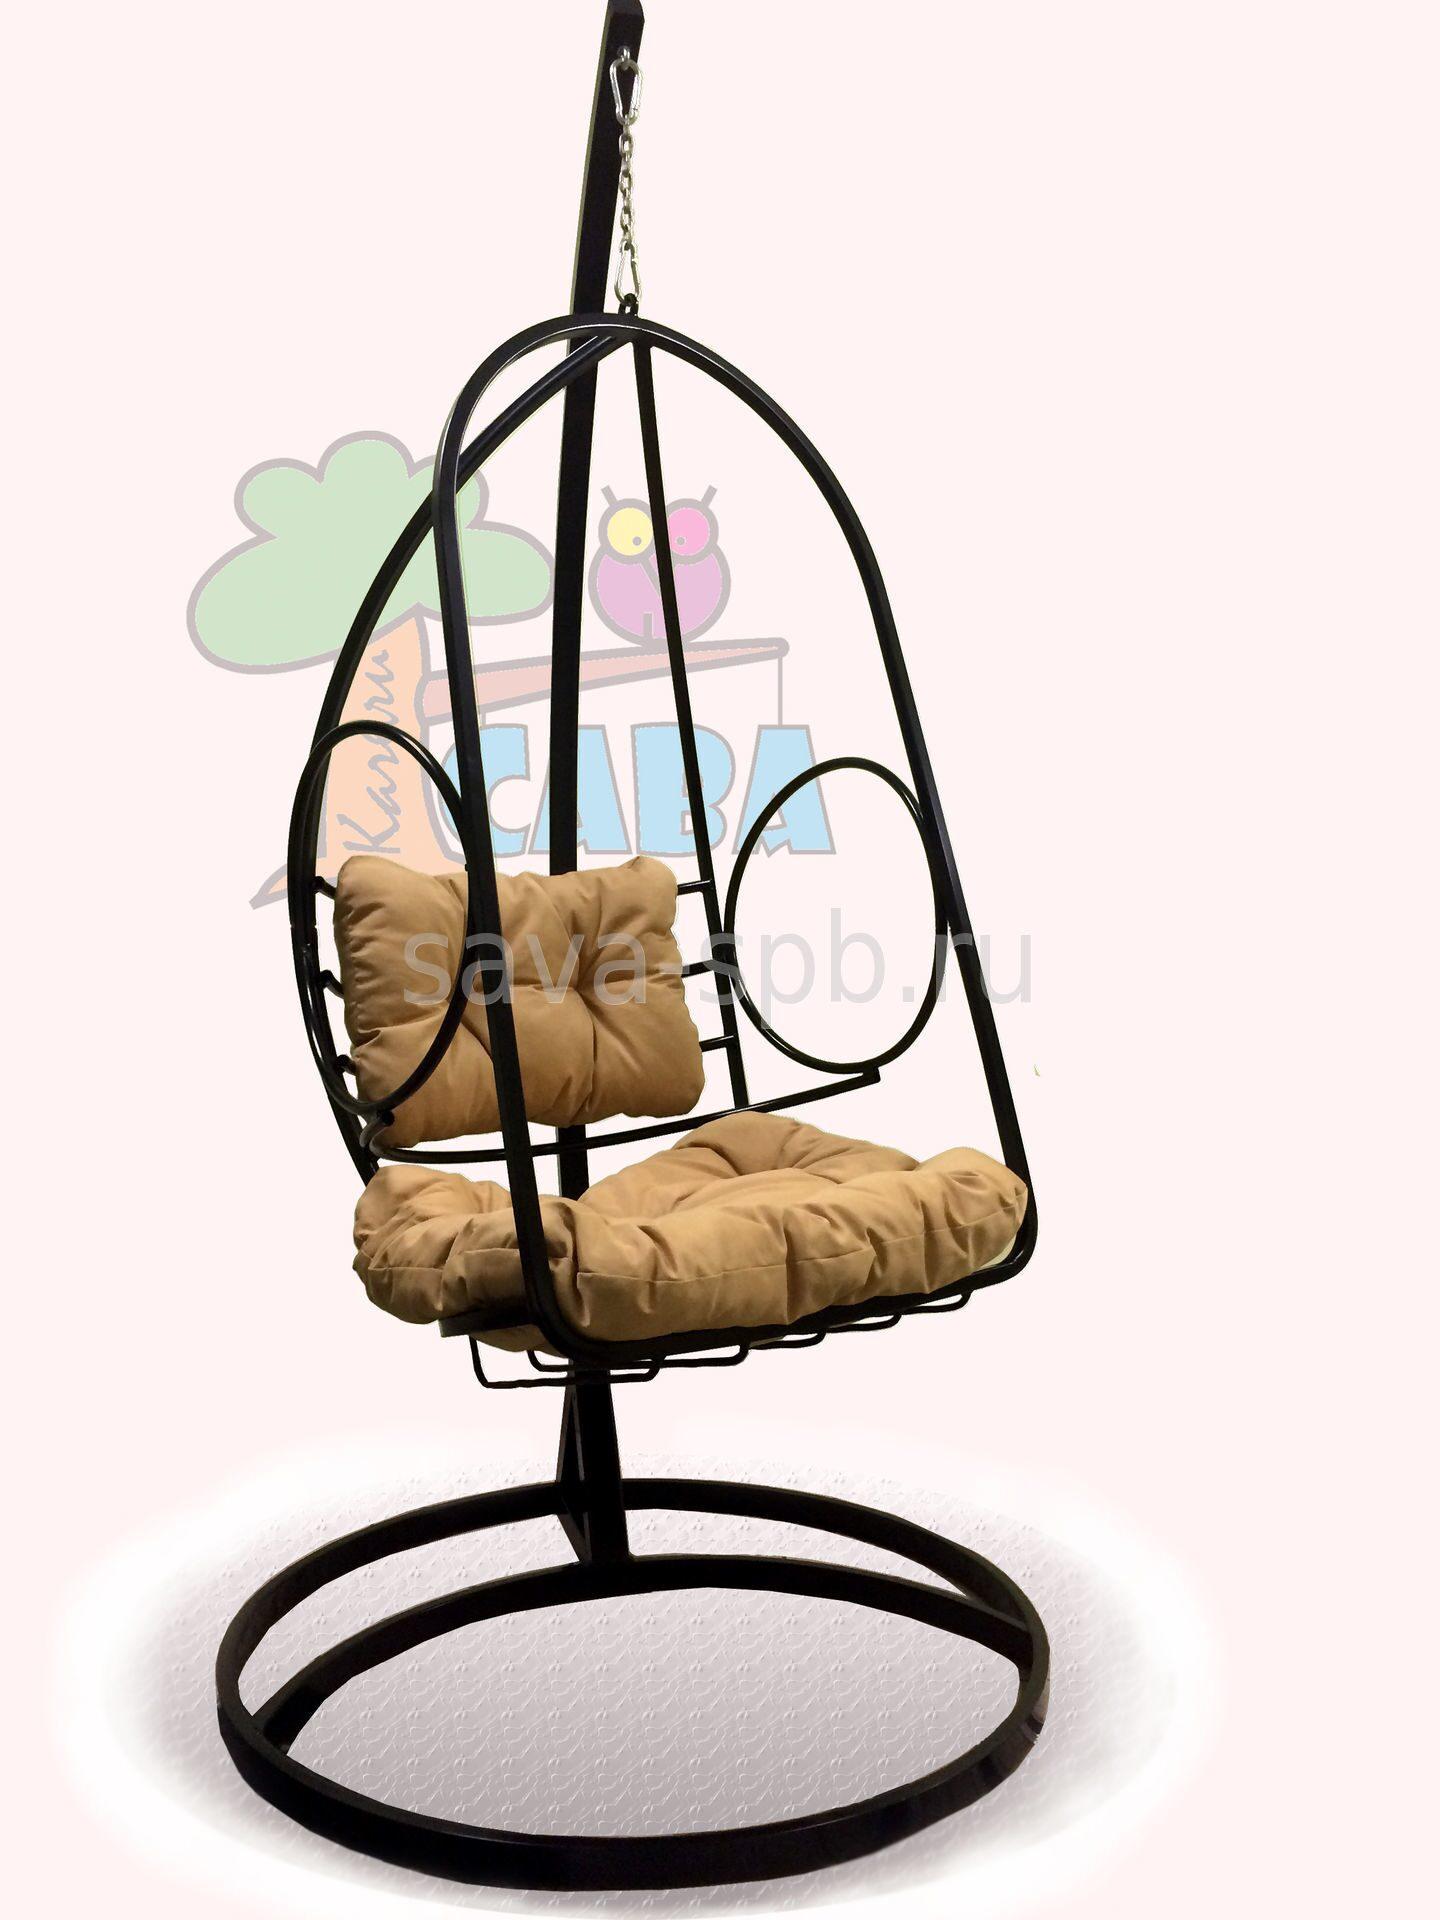 Подвесное кресло -кокон своими руками : мастер -класс 19